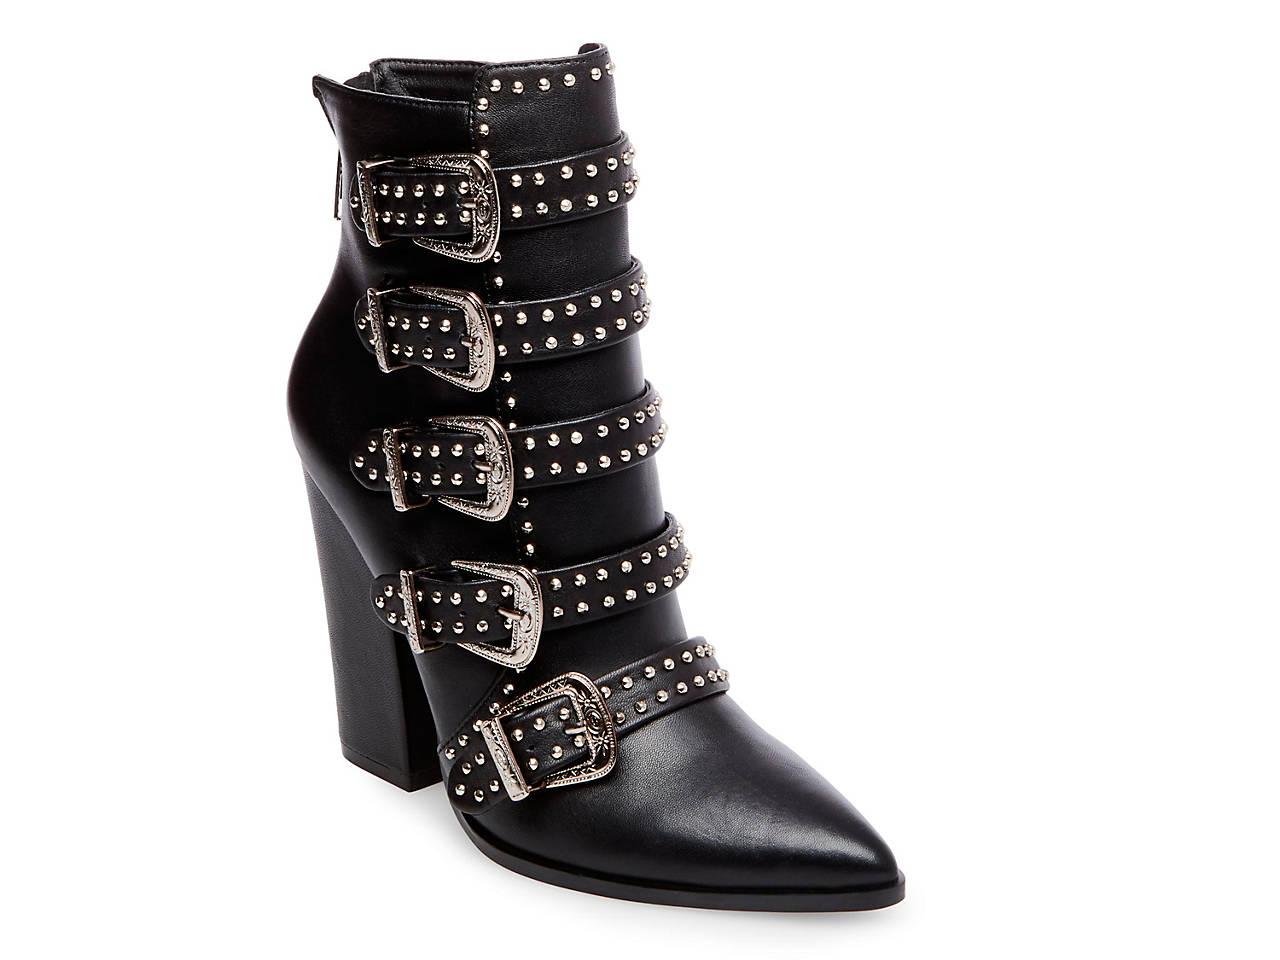 b18c8ea3d34 Steve Madden Comet Bootie Women s Shoes